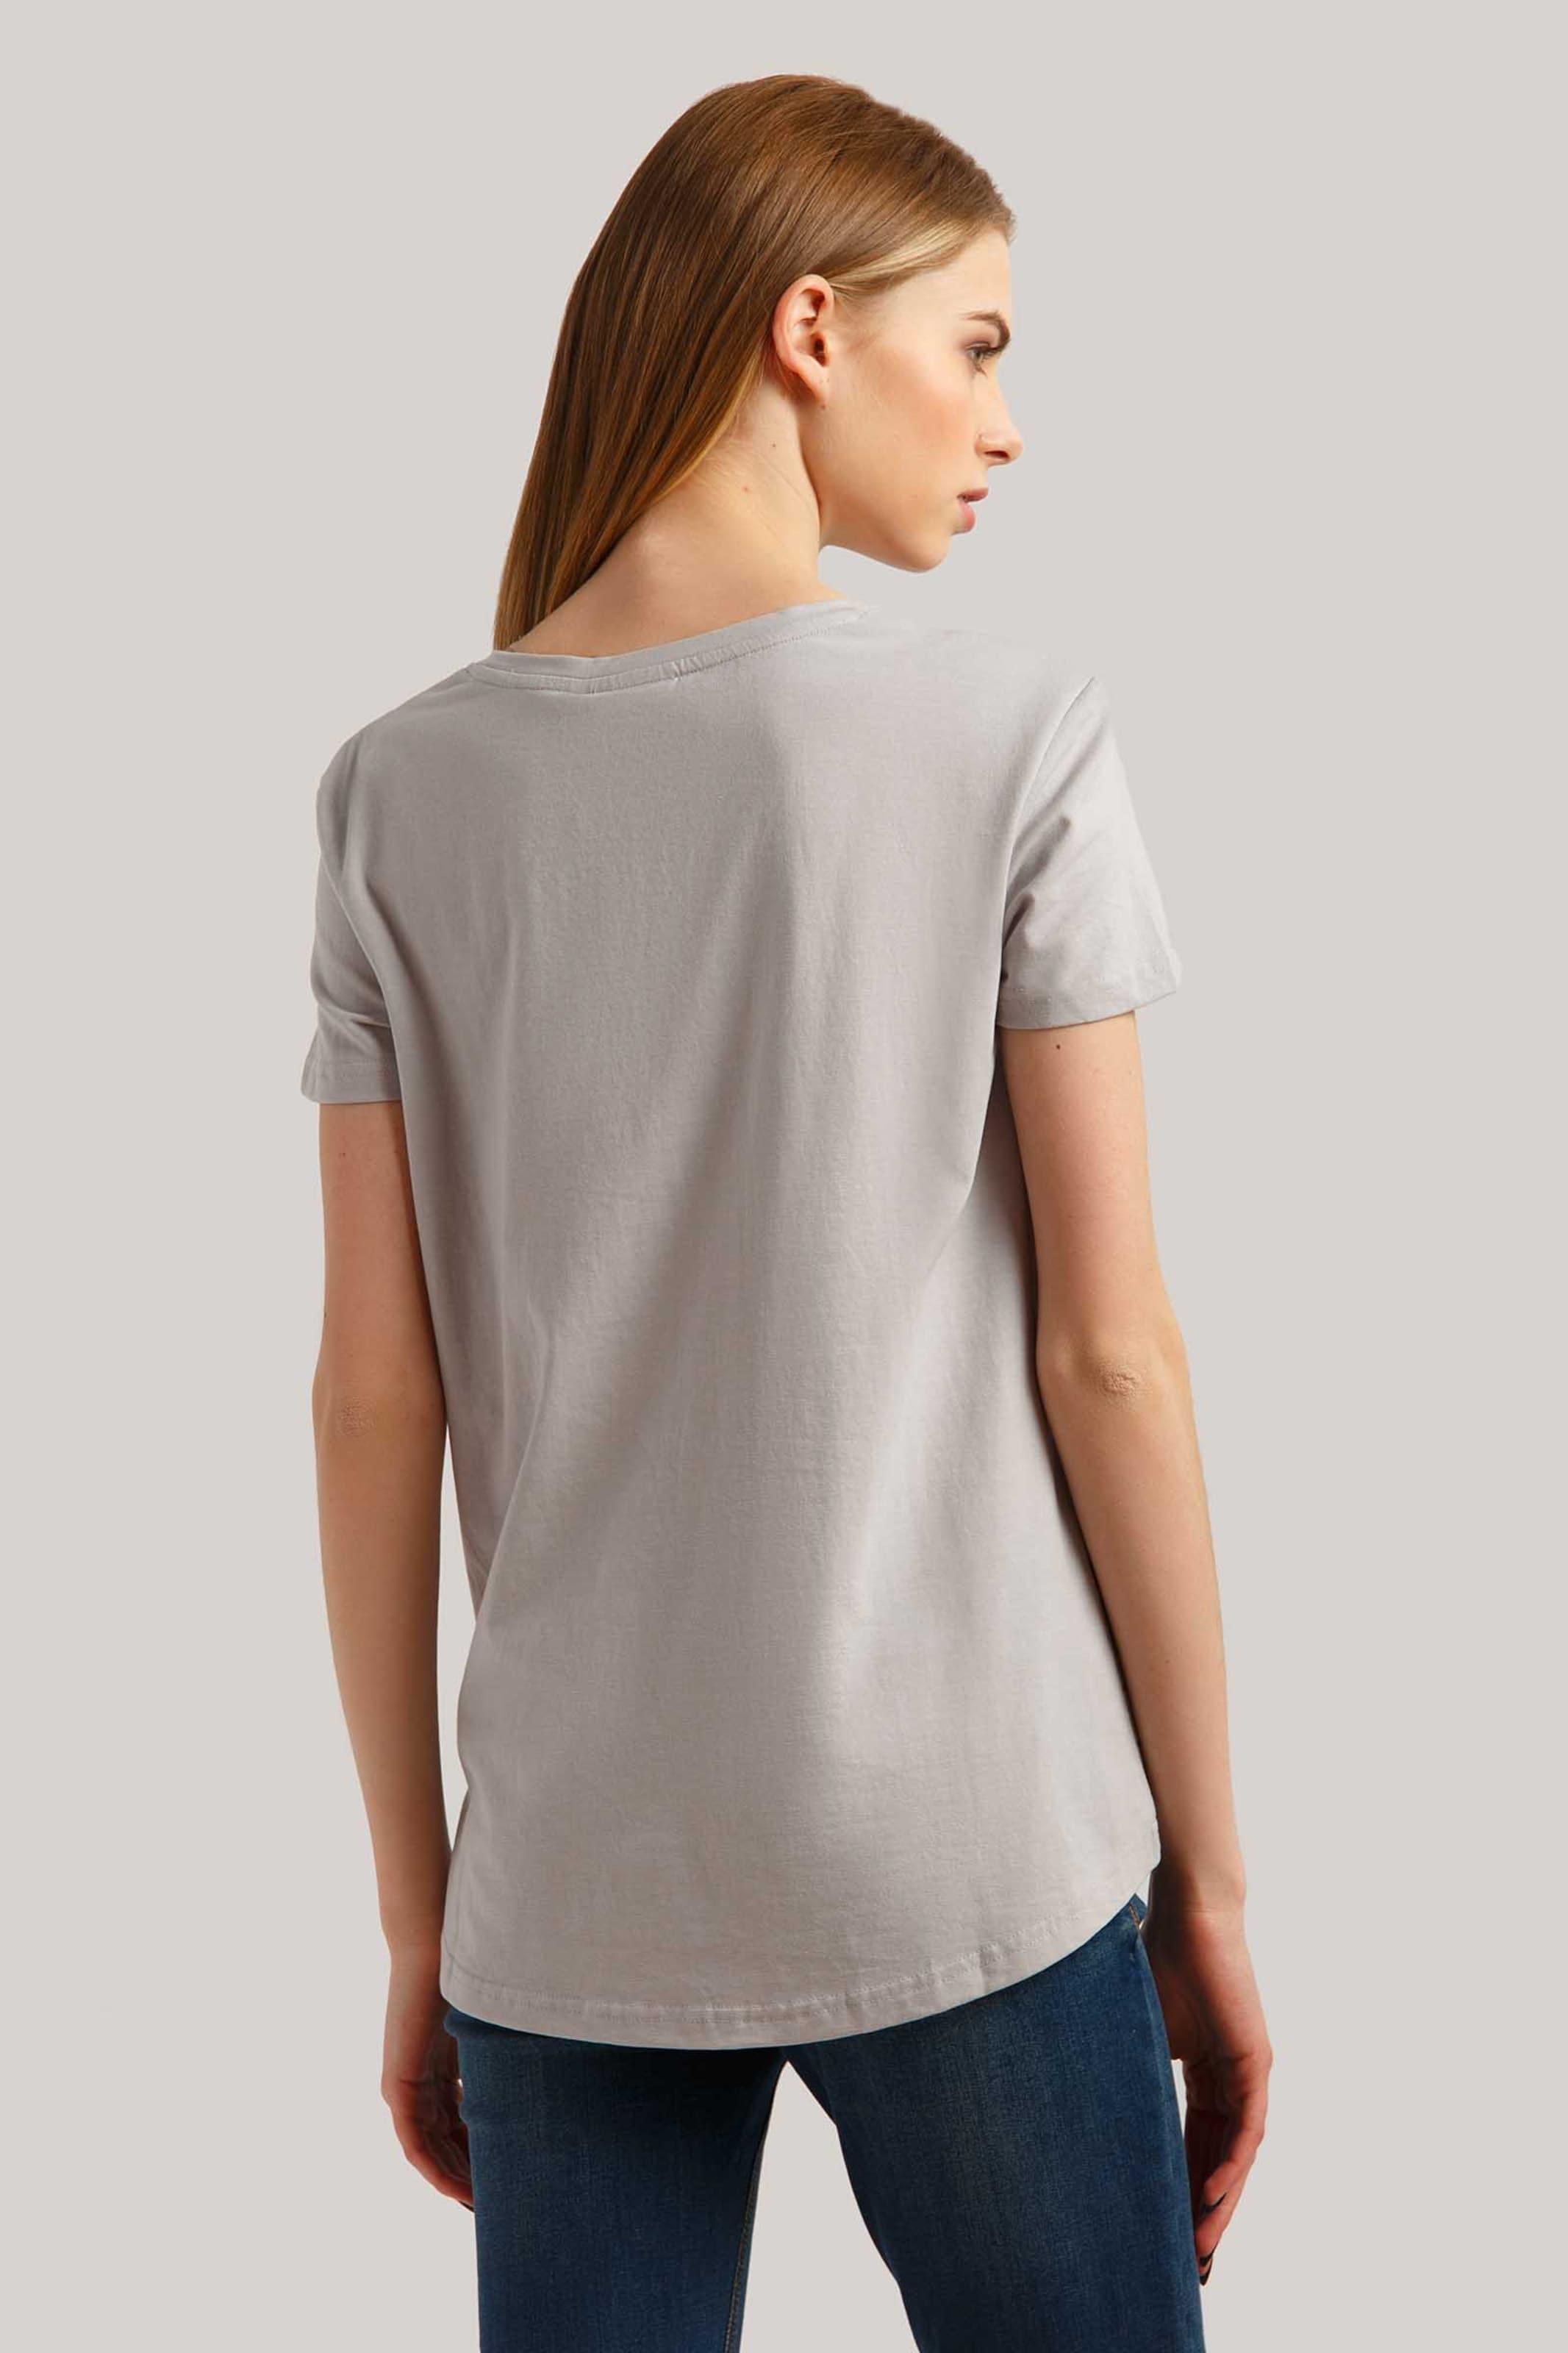 T In GrauMischfarben shirt Finn Flare 6Yfyvgb7